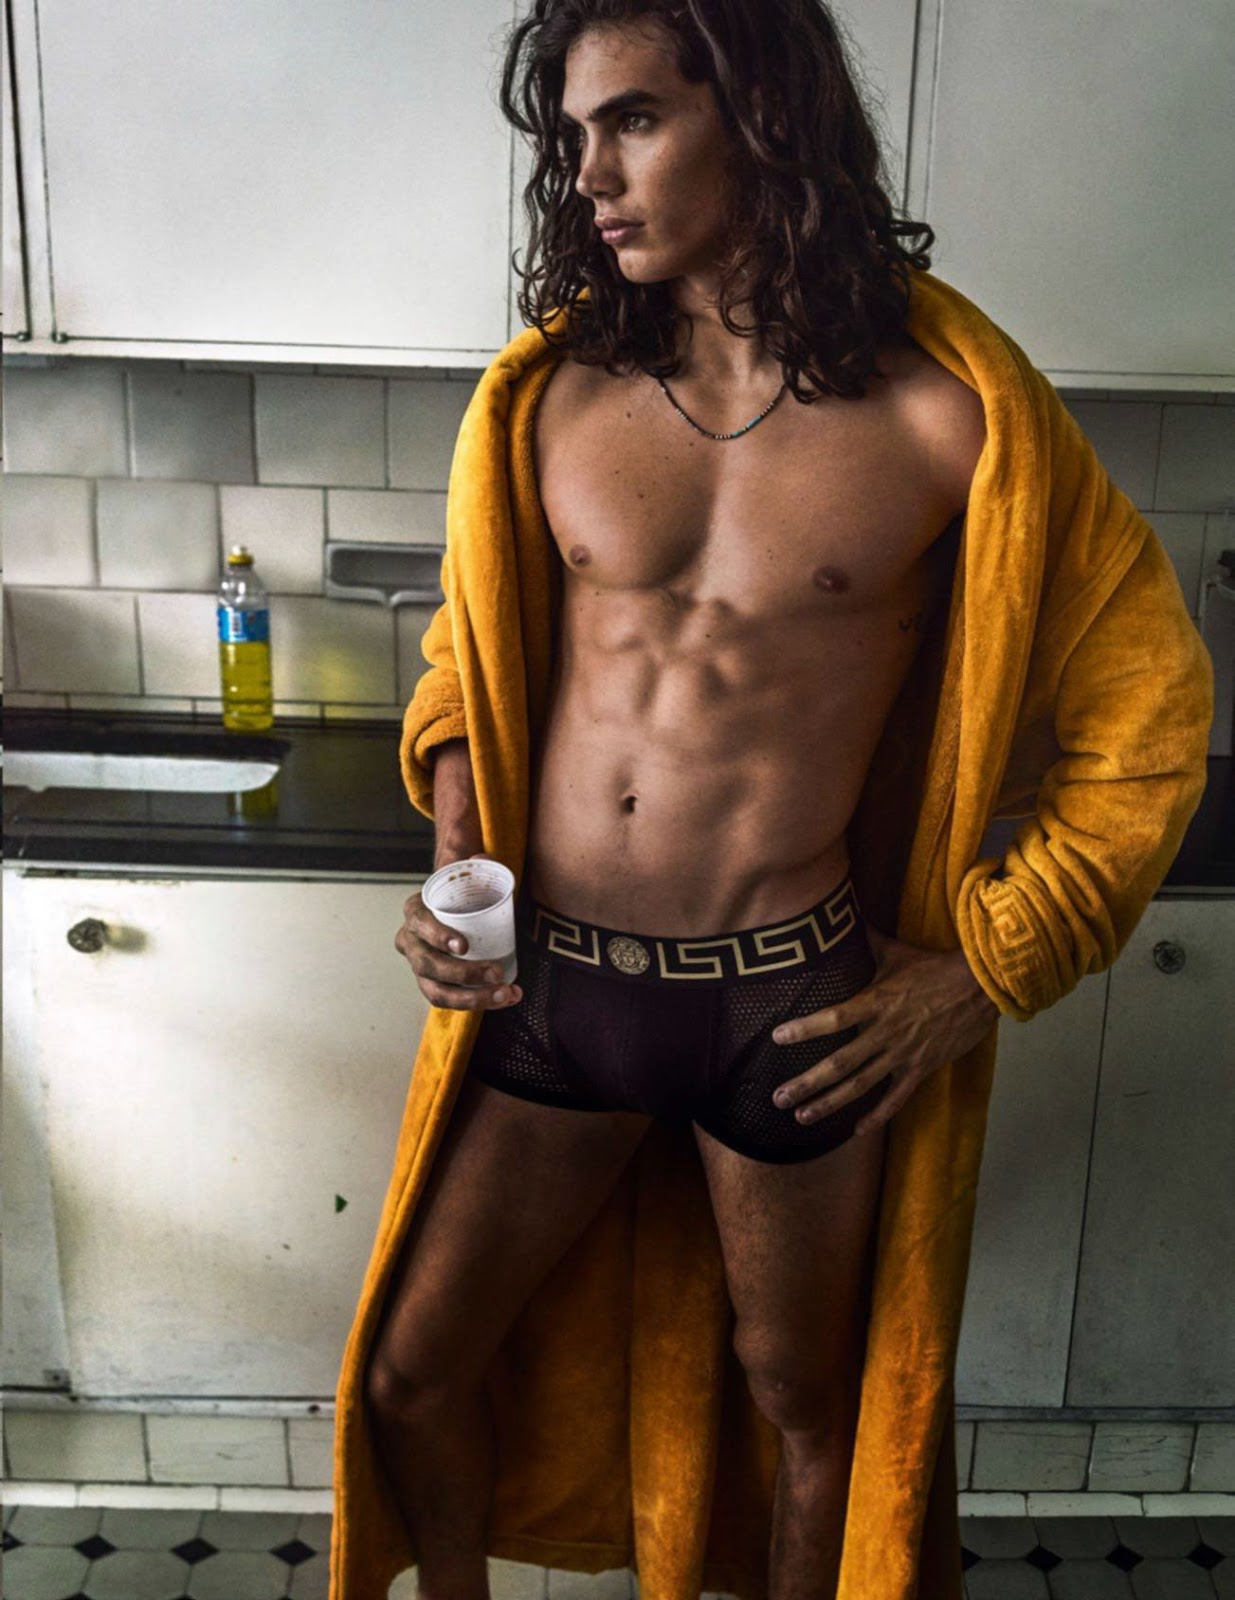 Naked gay twinks bodybuilder bryan licks 1